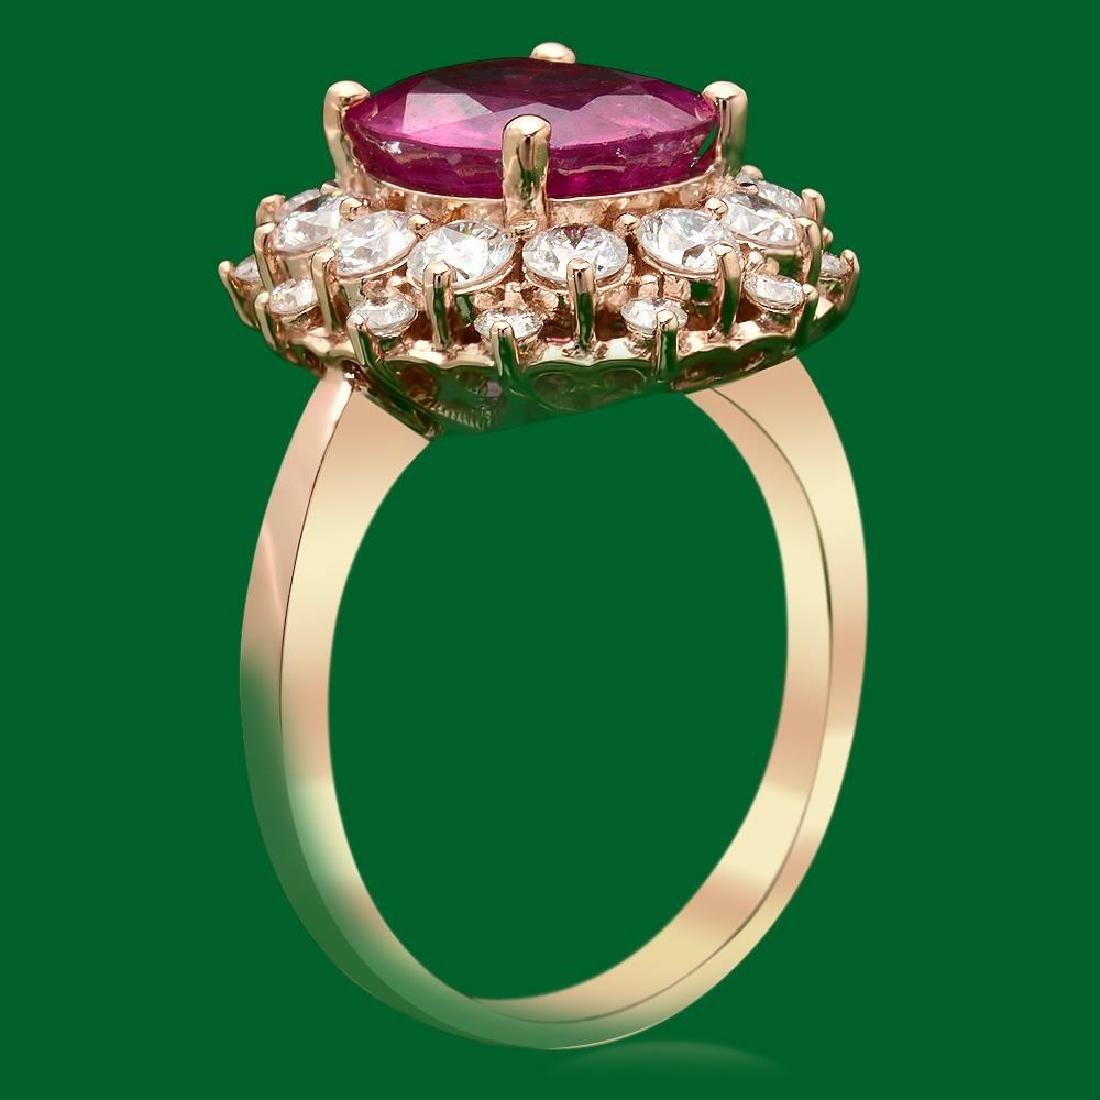 14k Gold 4.05ct Ruby 1.60ct Diamond Ring - 2